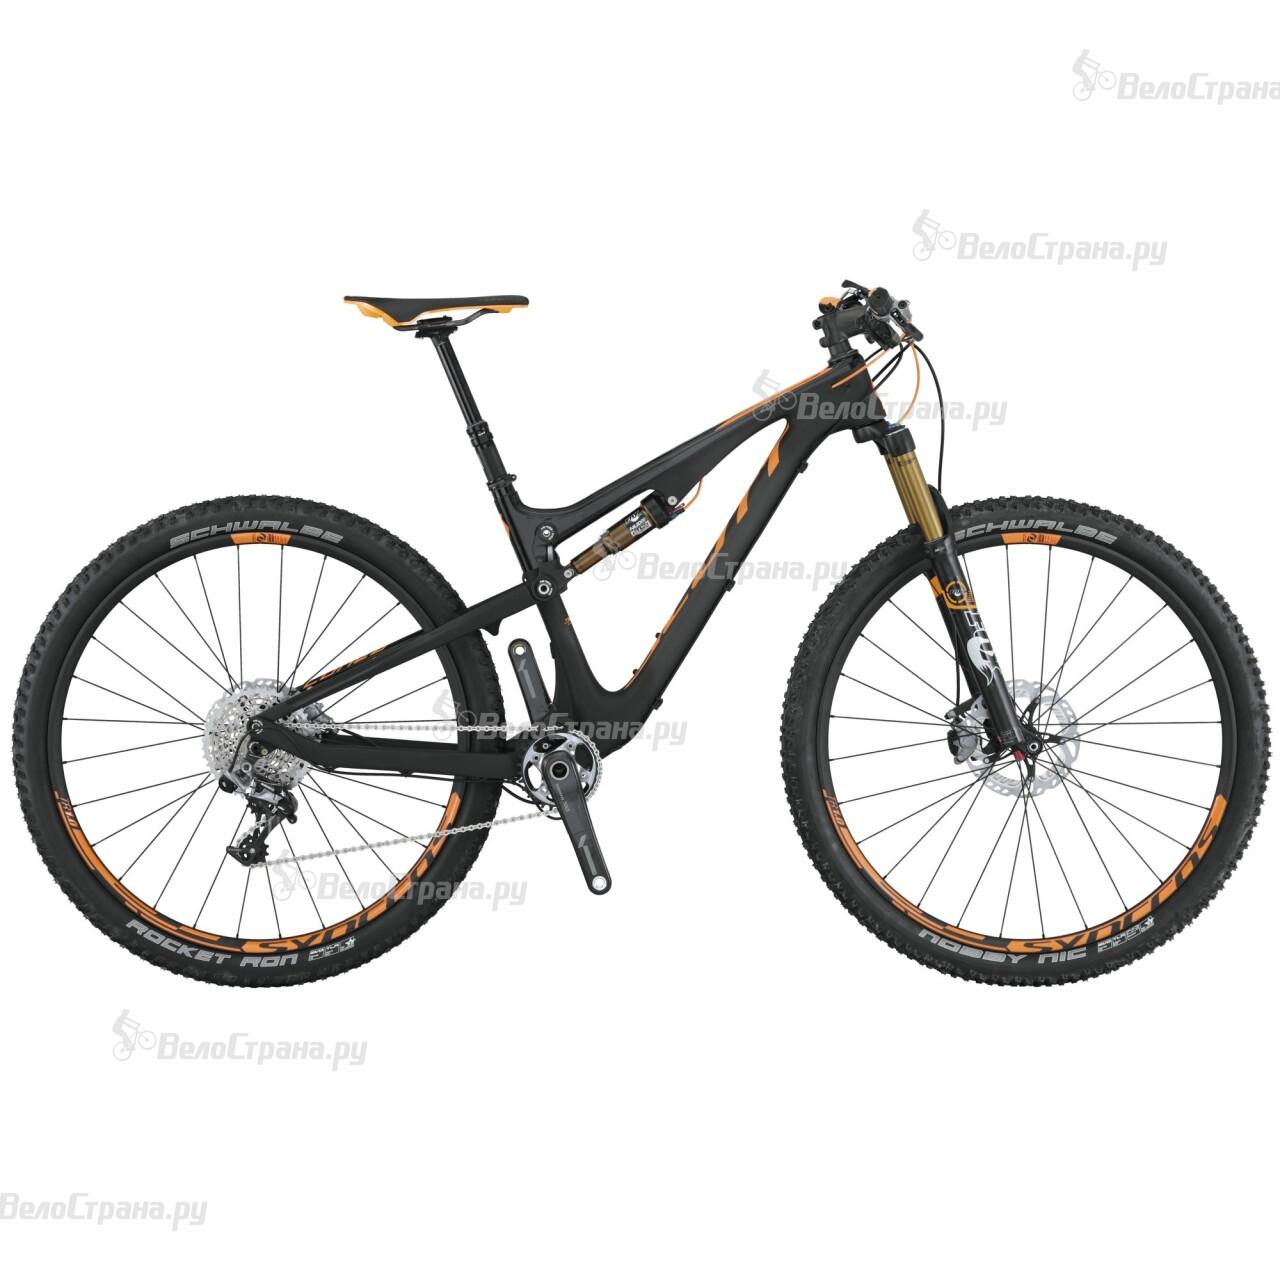 Велосипед Scott Genius 900 Tuned (2015) велосипед scott genius lt 700 tuned plus 2016